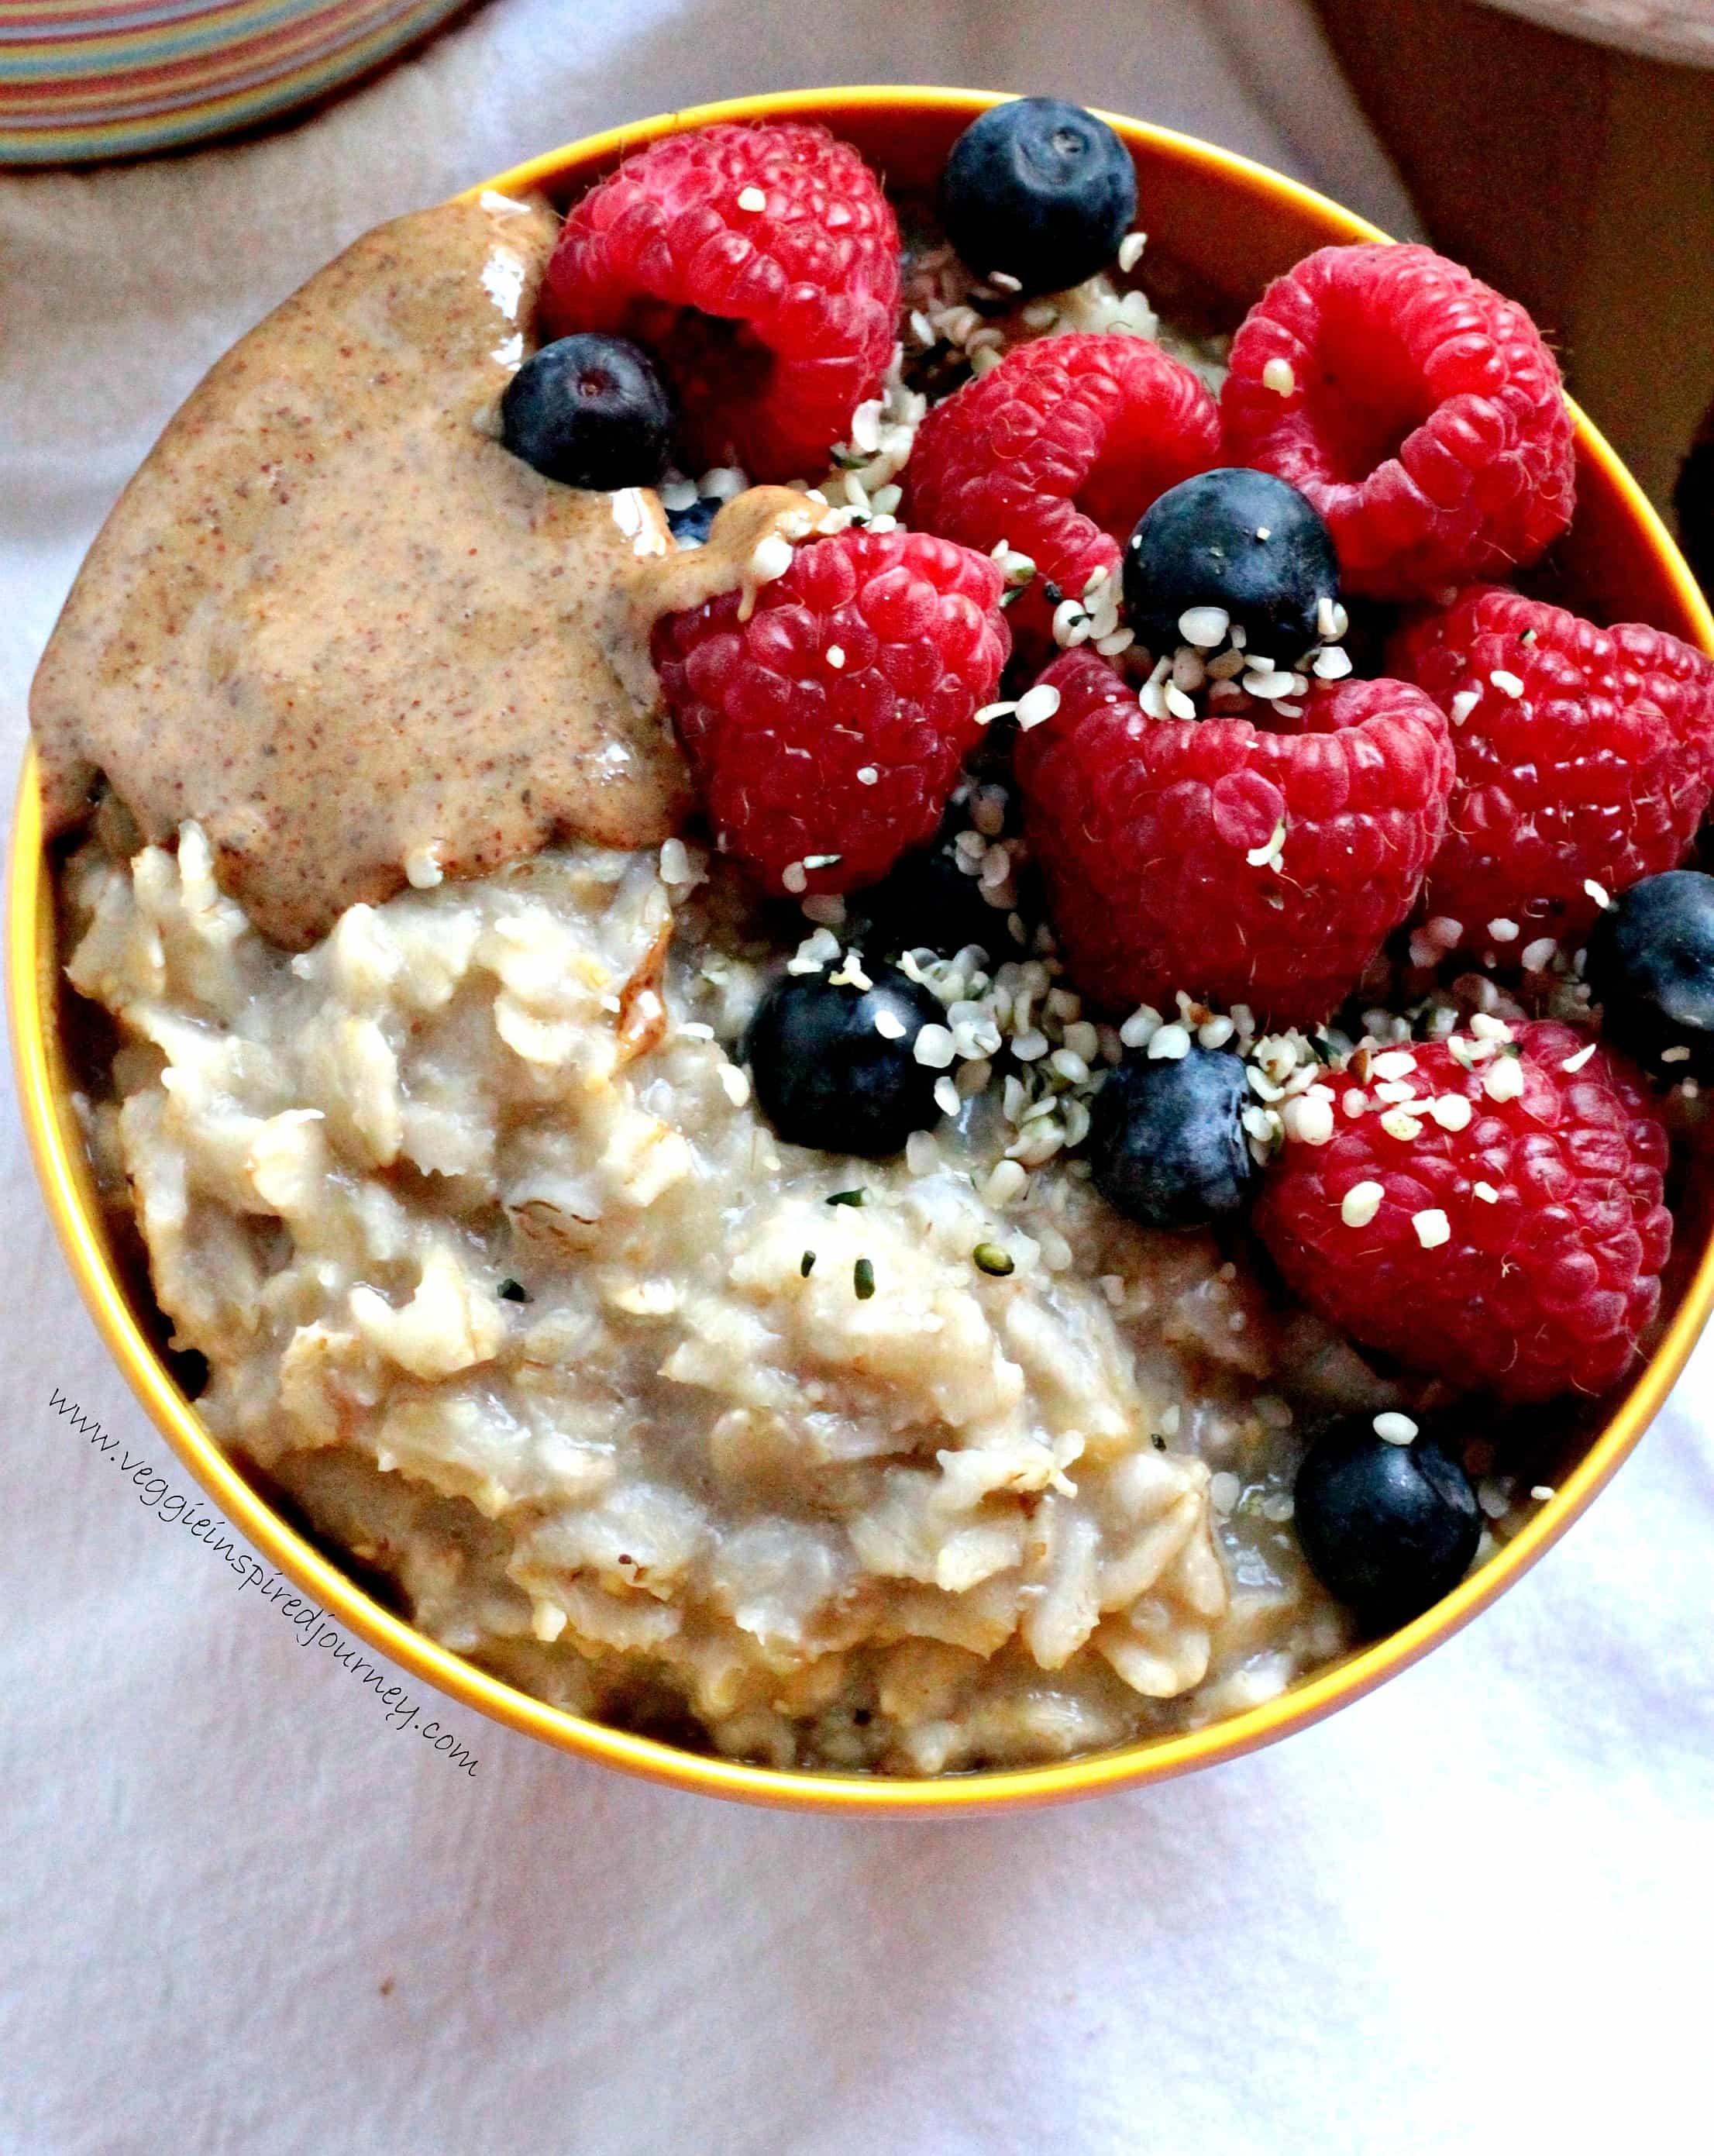 Healthy Oatmeal Breakfast  Easy Sweet Creamy Customizable Healthy Oatmeal